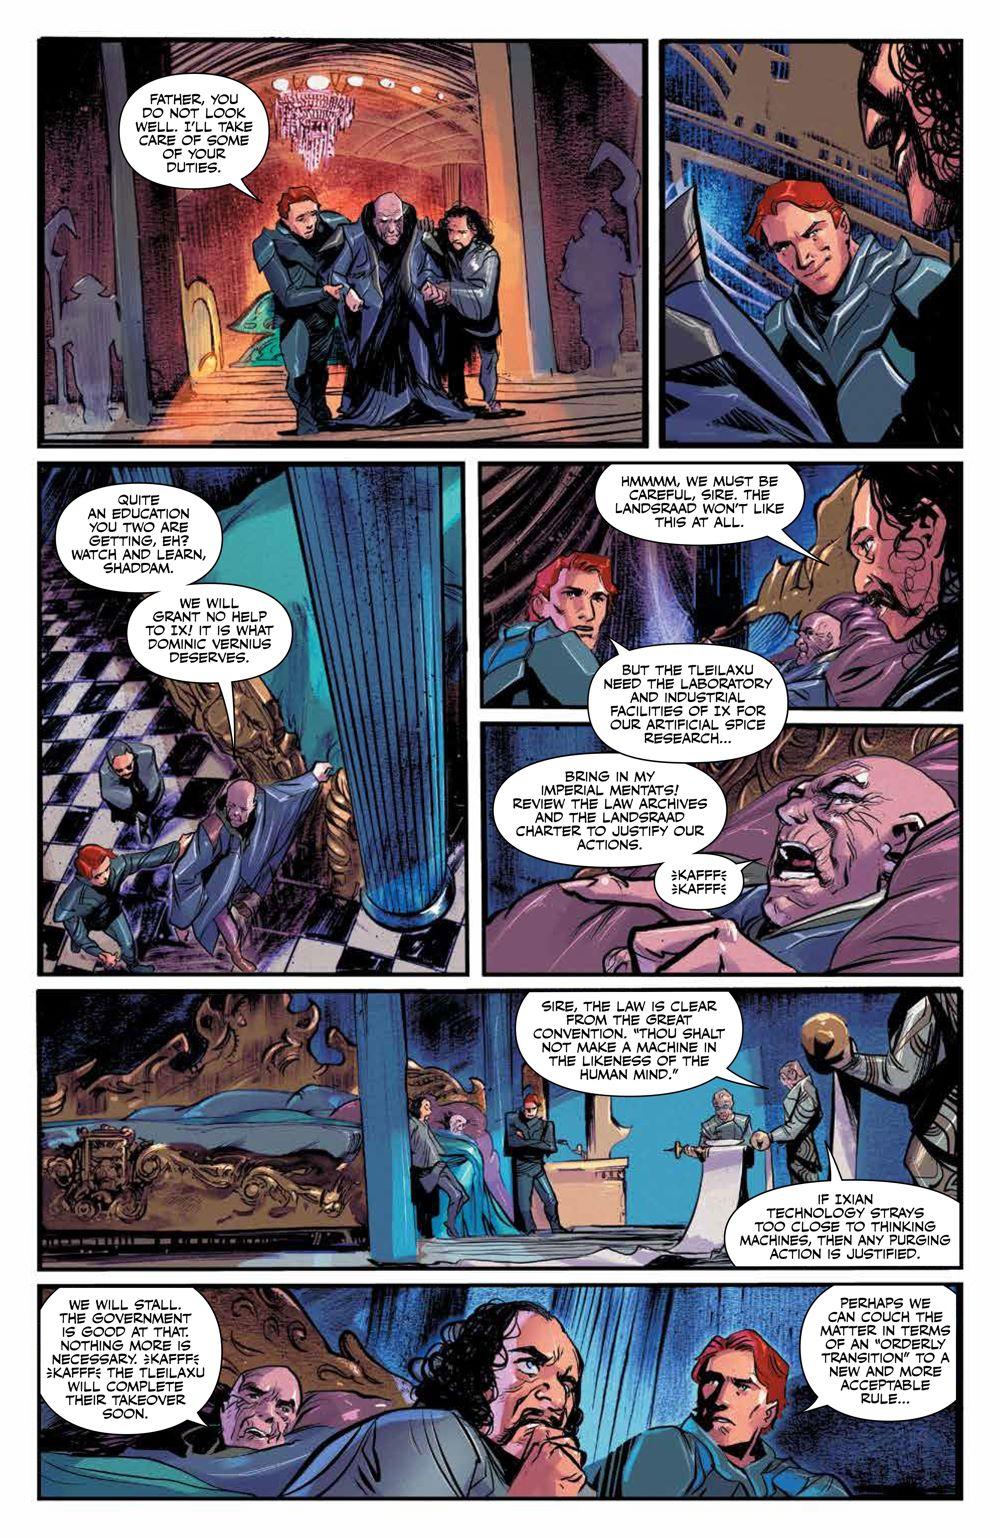 Dune_HouseAtreides_006_PRESS_6 ComicList Previews: DUNE HOUSE ATREIDES #6 (OF 12)